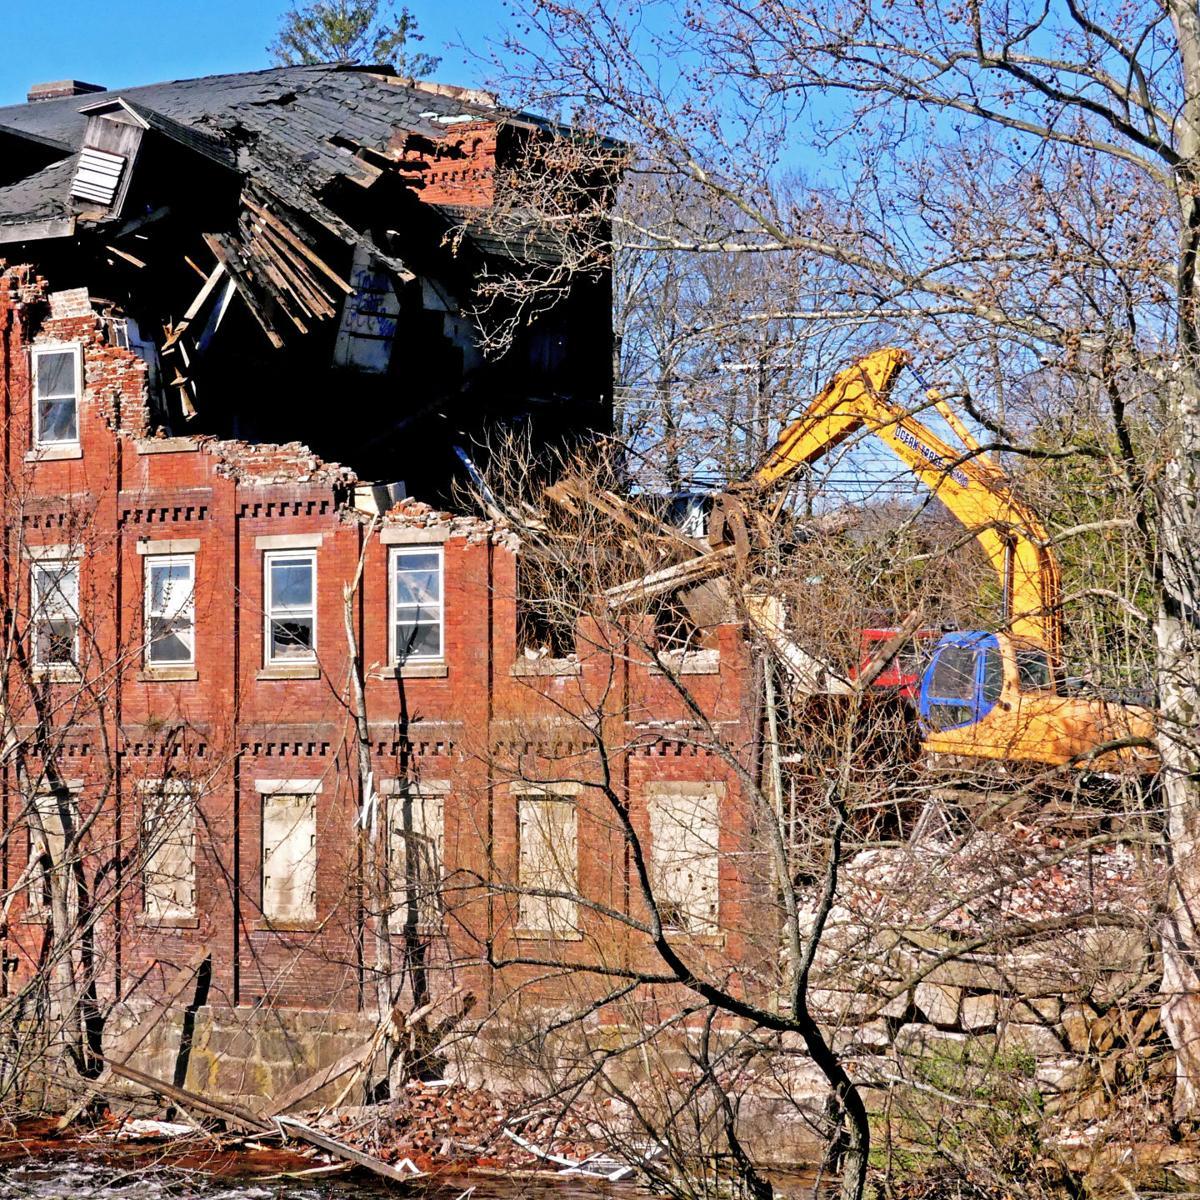 041619 PAW Old Conn Casting demolished 382.JPG